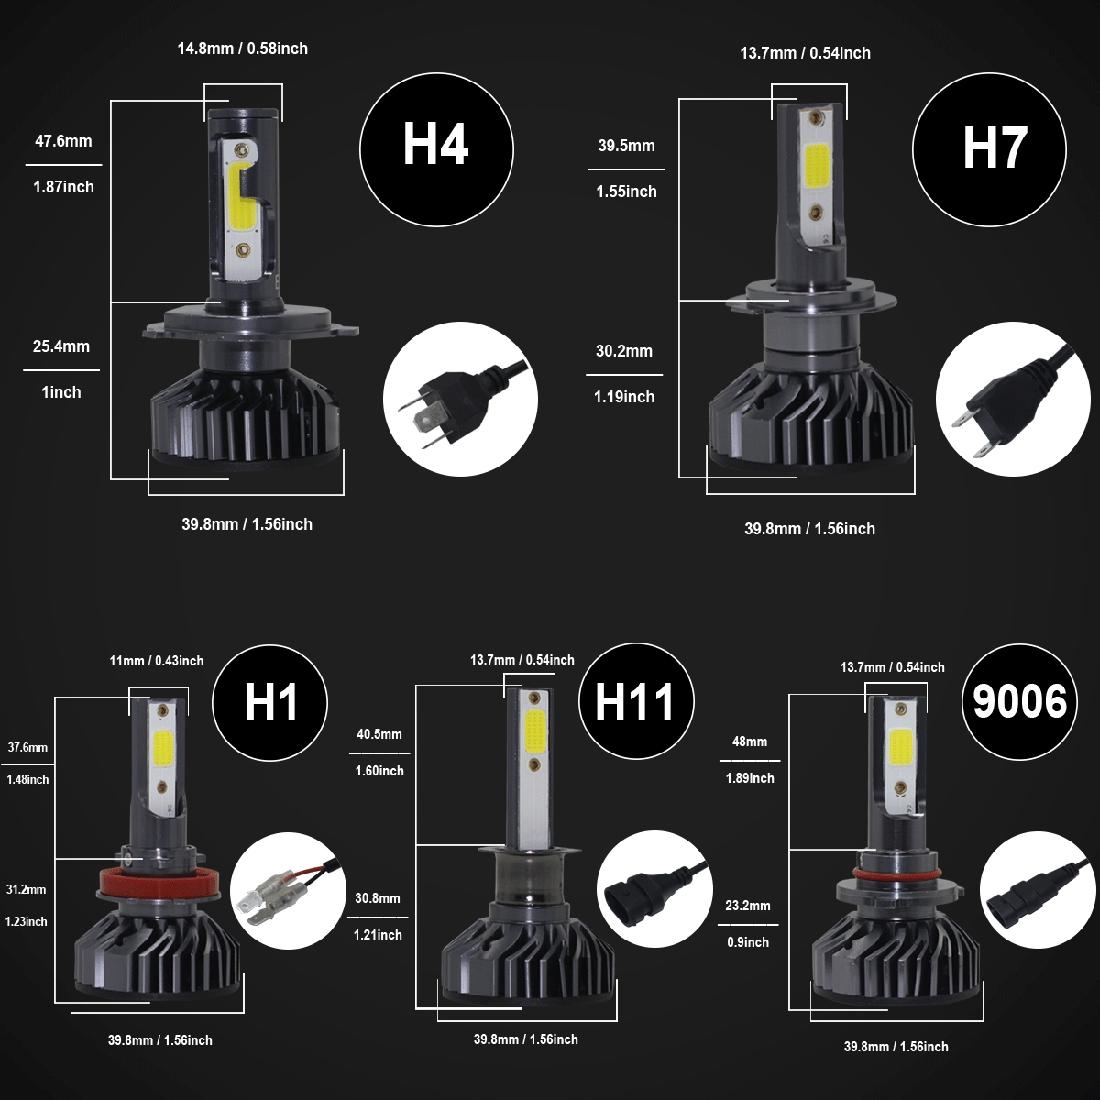 EV8 2 PCS 9005 / HB3 DOB 36W 3000LM 6500K LED Headlight Bulbs High Beam Conversion Kit DC 9-32V (Xenon White)